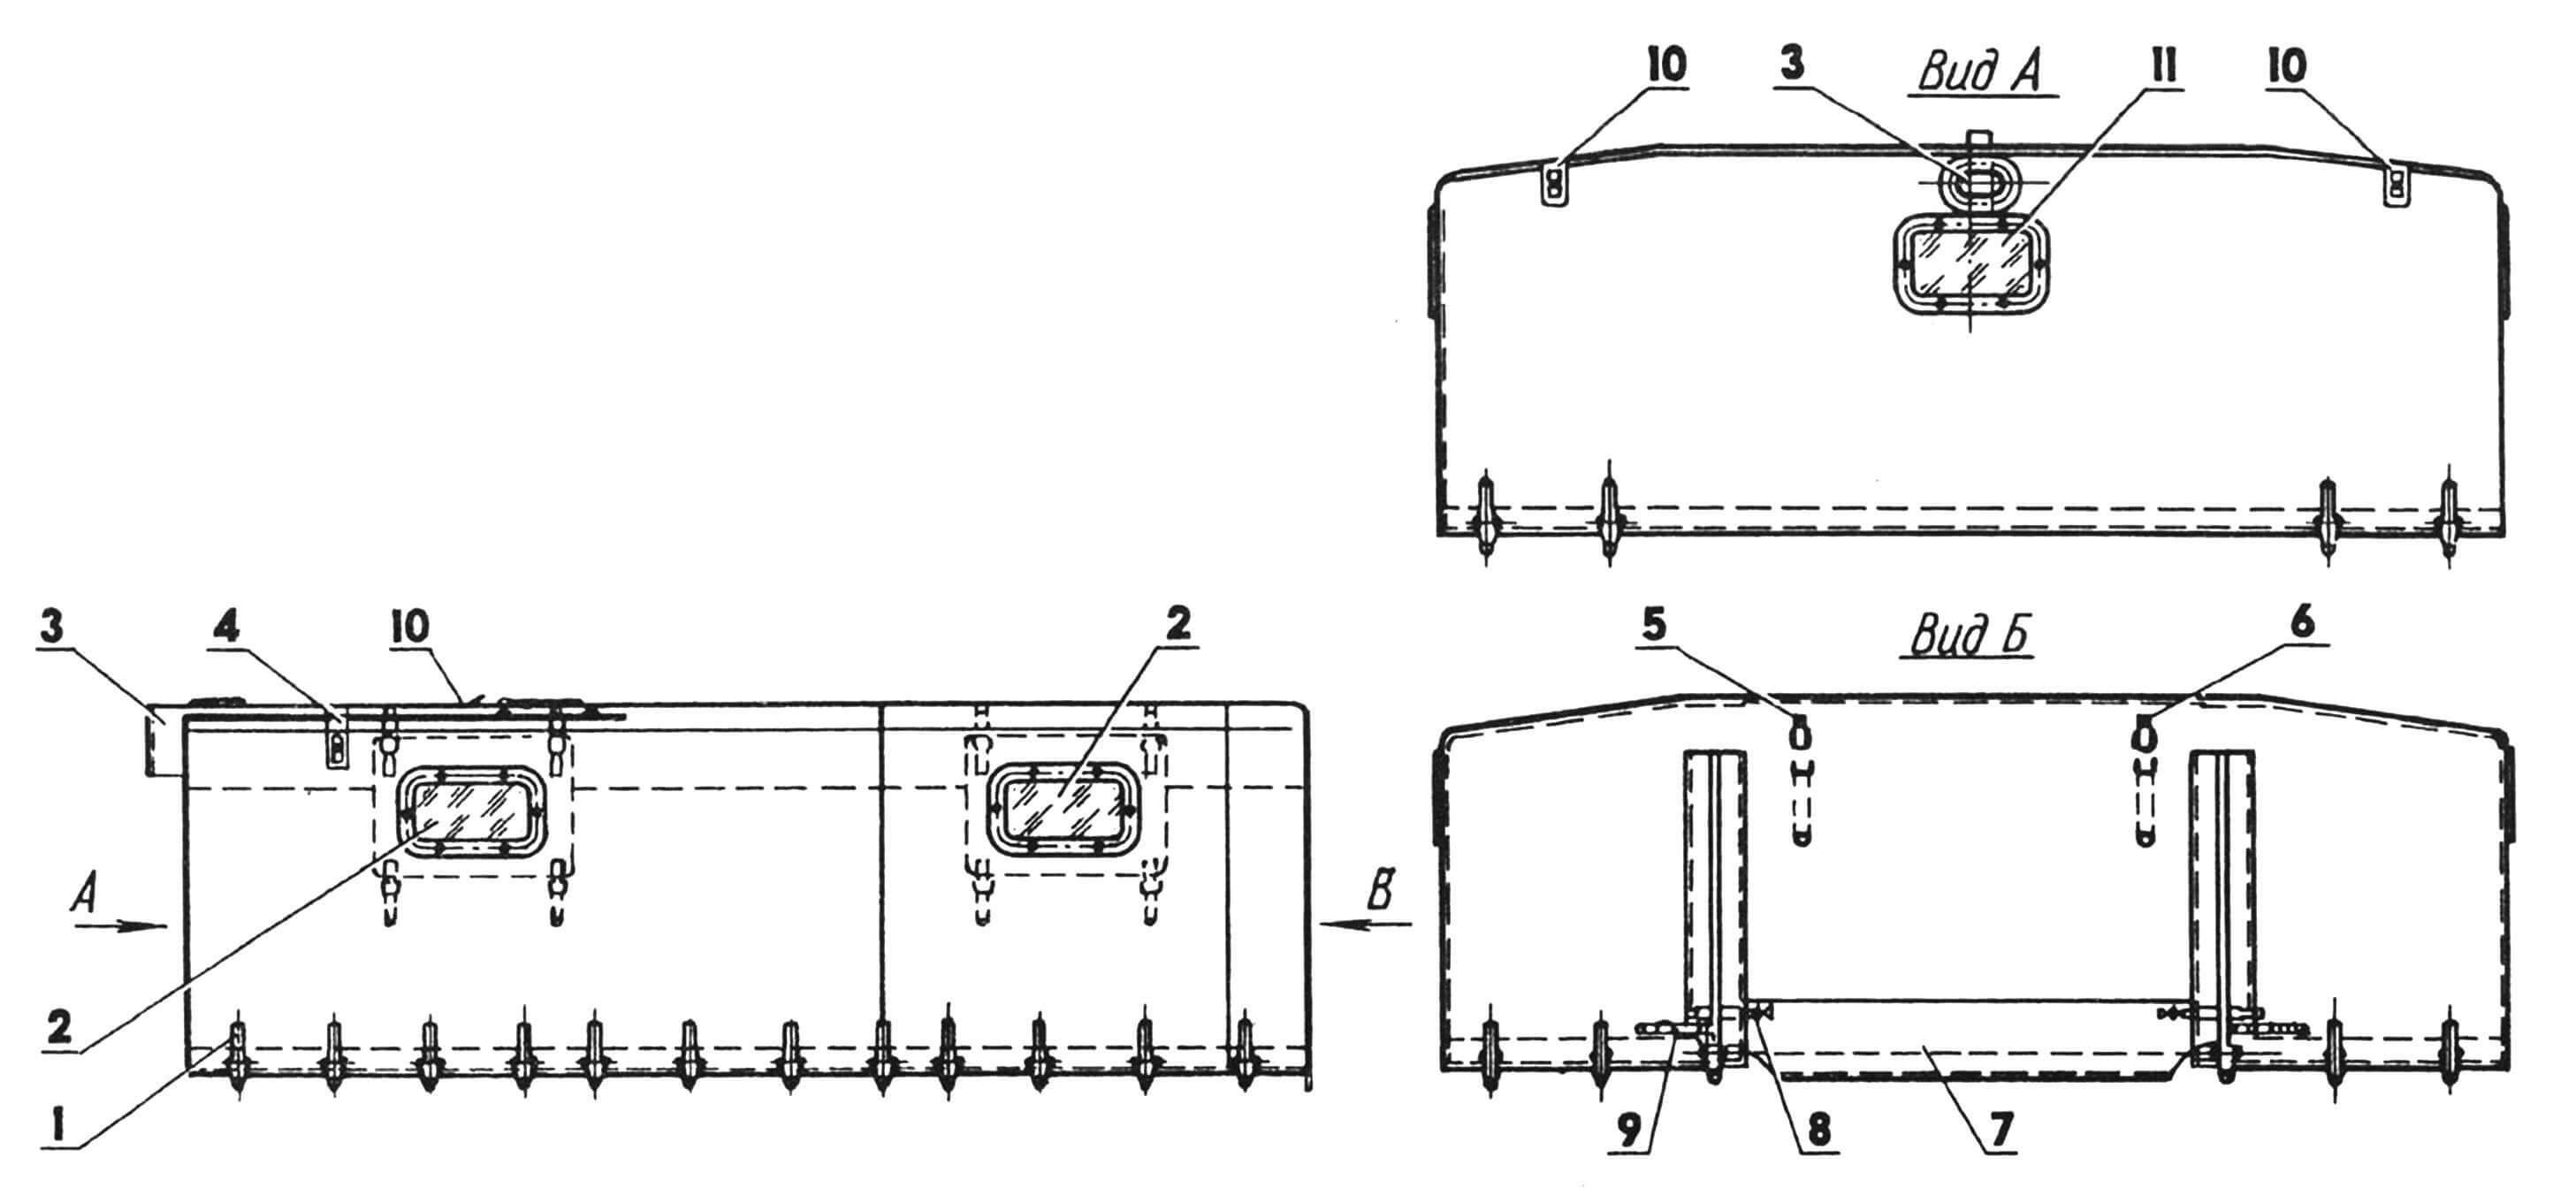 Тент: 1, 5, 6, 8, 9 — ремни тента; 2 — окна боковые; 3 — чехол плафона кузова; 4, 10 — ремни крепления укрывочного брезента; 7 — клапан; 11 — окно переднее.